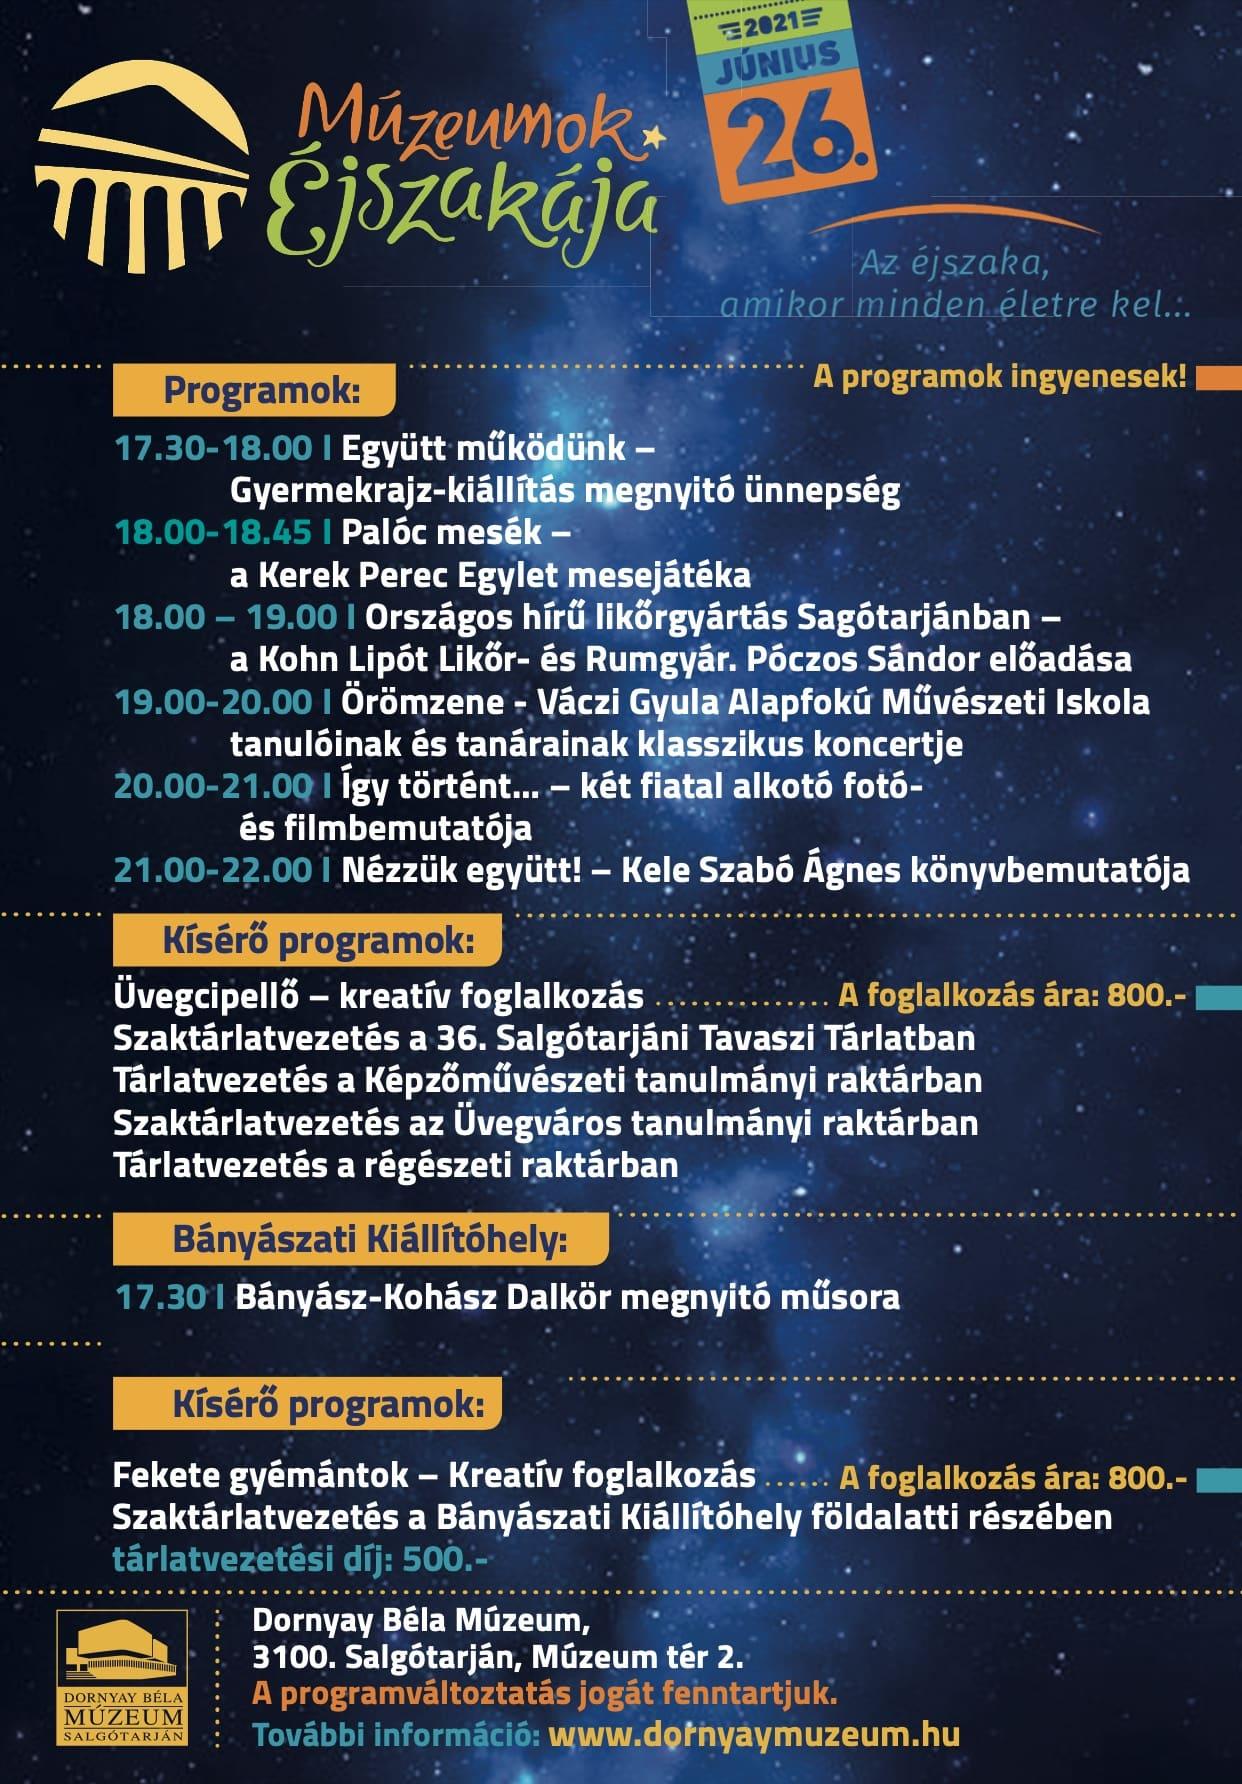 junius 26 muzeumok ejszakaja salgotarjan dornyay bela muzeum